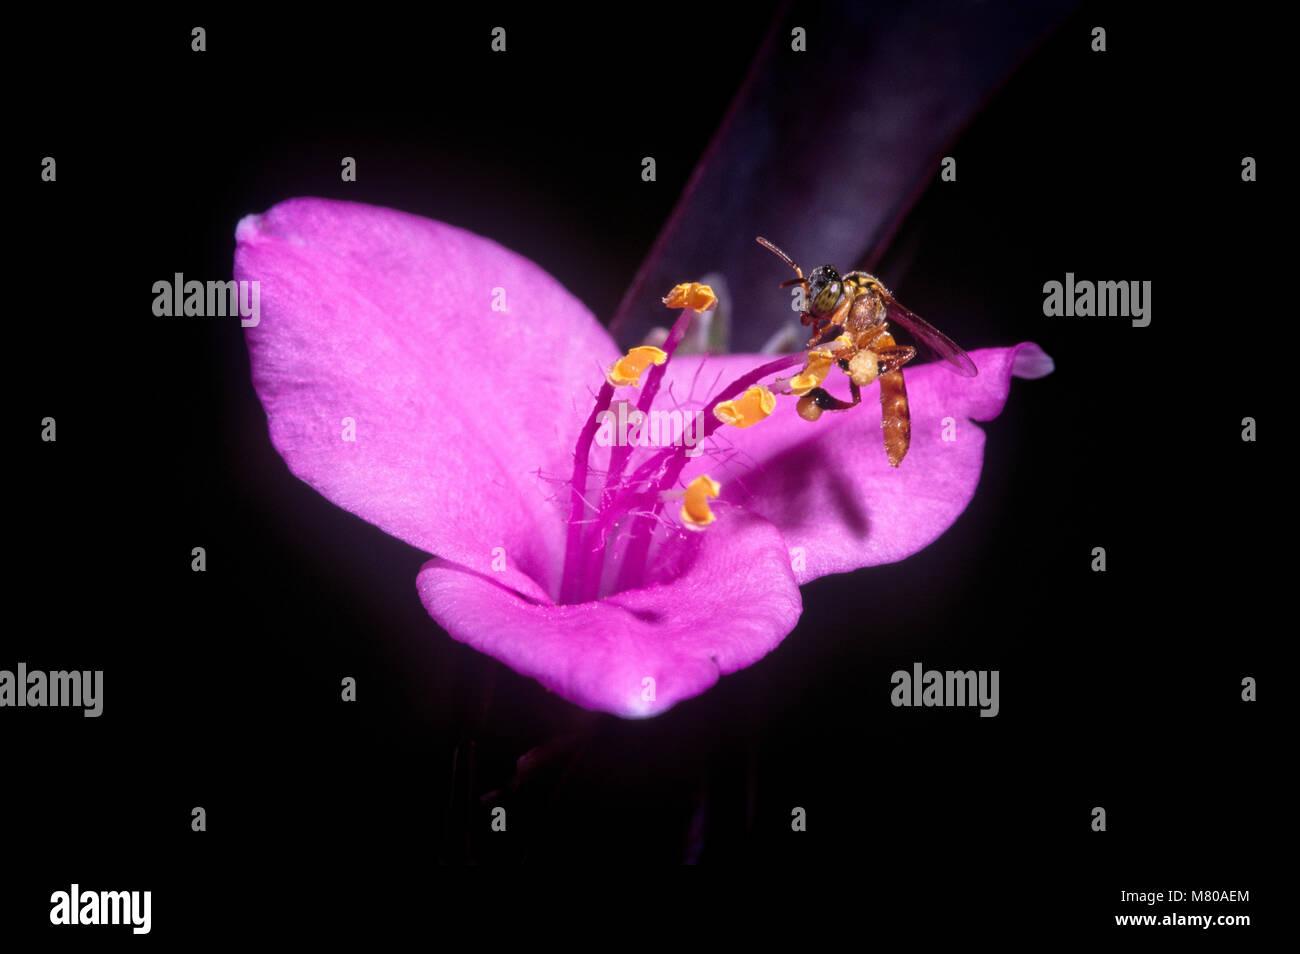 Eusocial stingless bee (Tetragonisca angustula), Foz do Iguaçu, Brazil - Stock Image